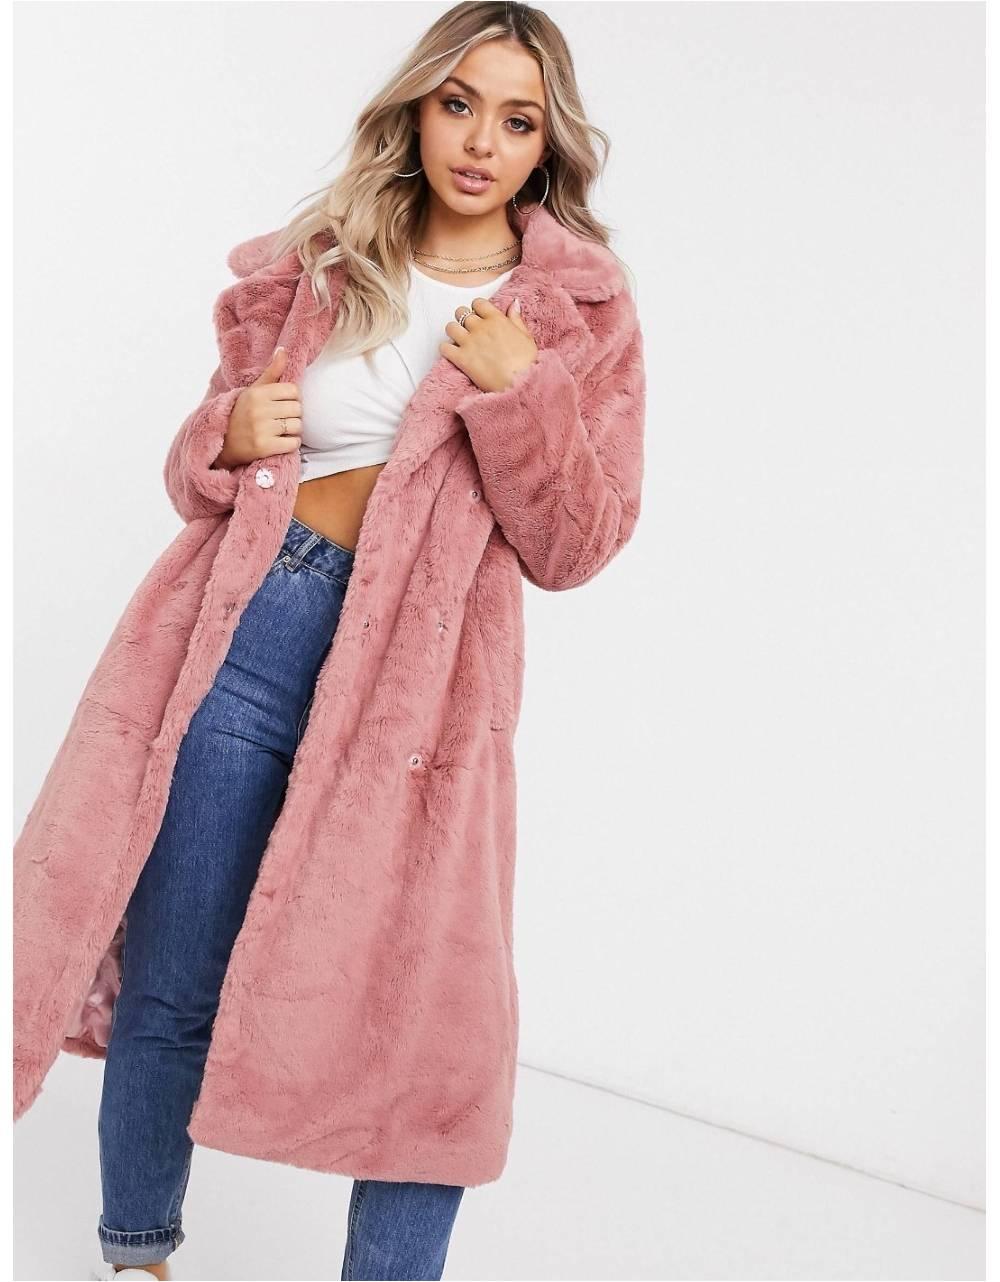 NA-KD faux fur coat - dusty rose NA-KD Coat 140,00€